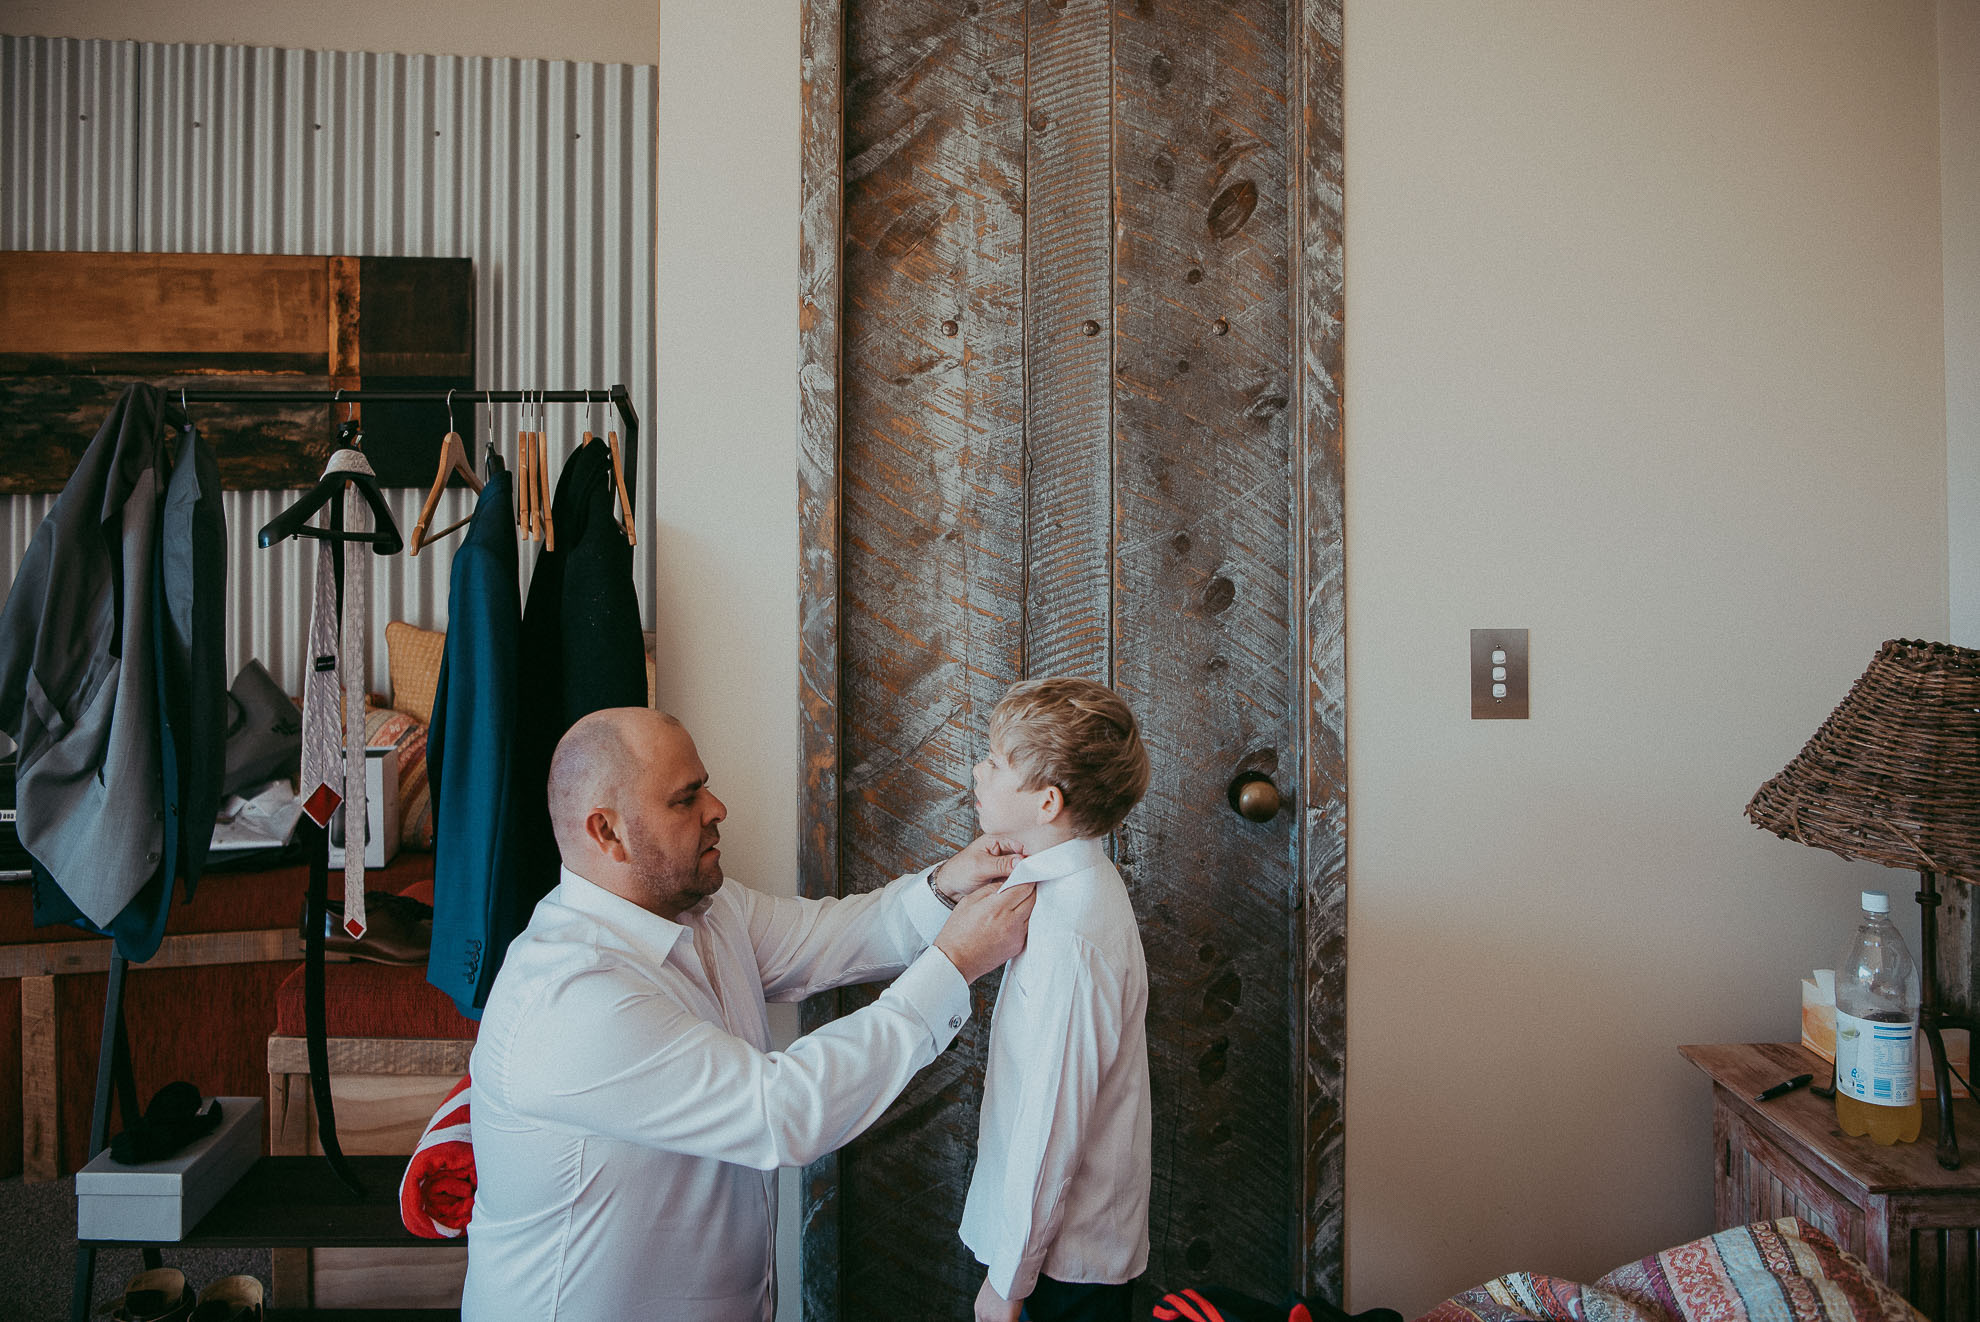 Tawharanui Winter Wedding - Koru House {Auckland elopement-engagement photographer}